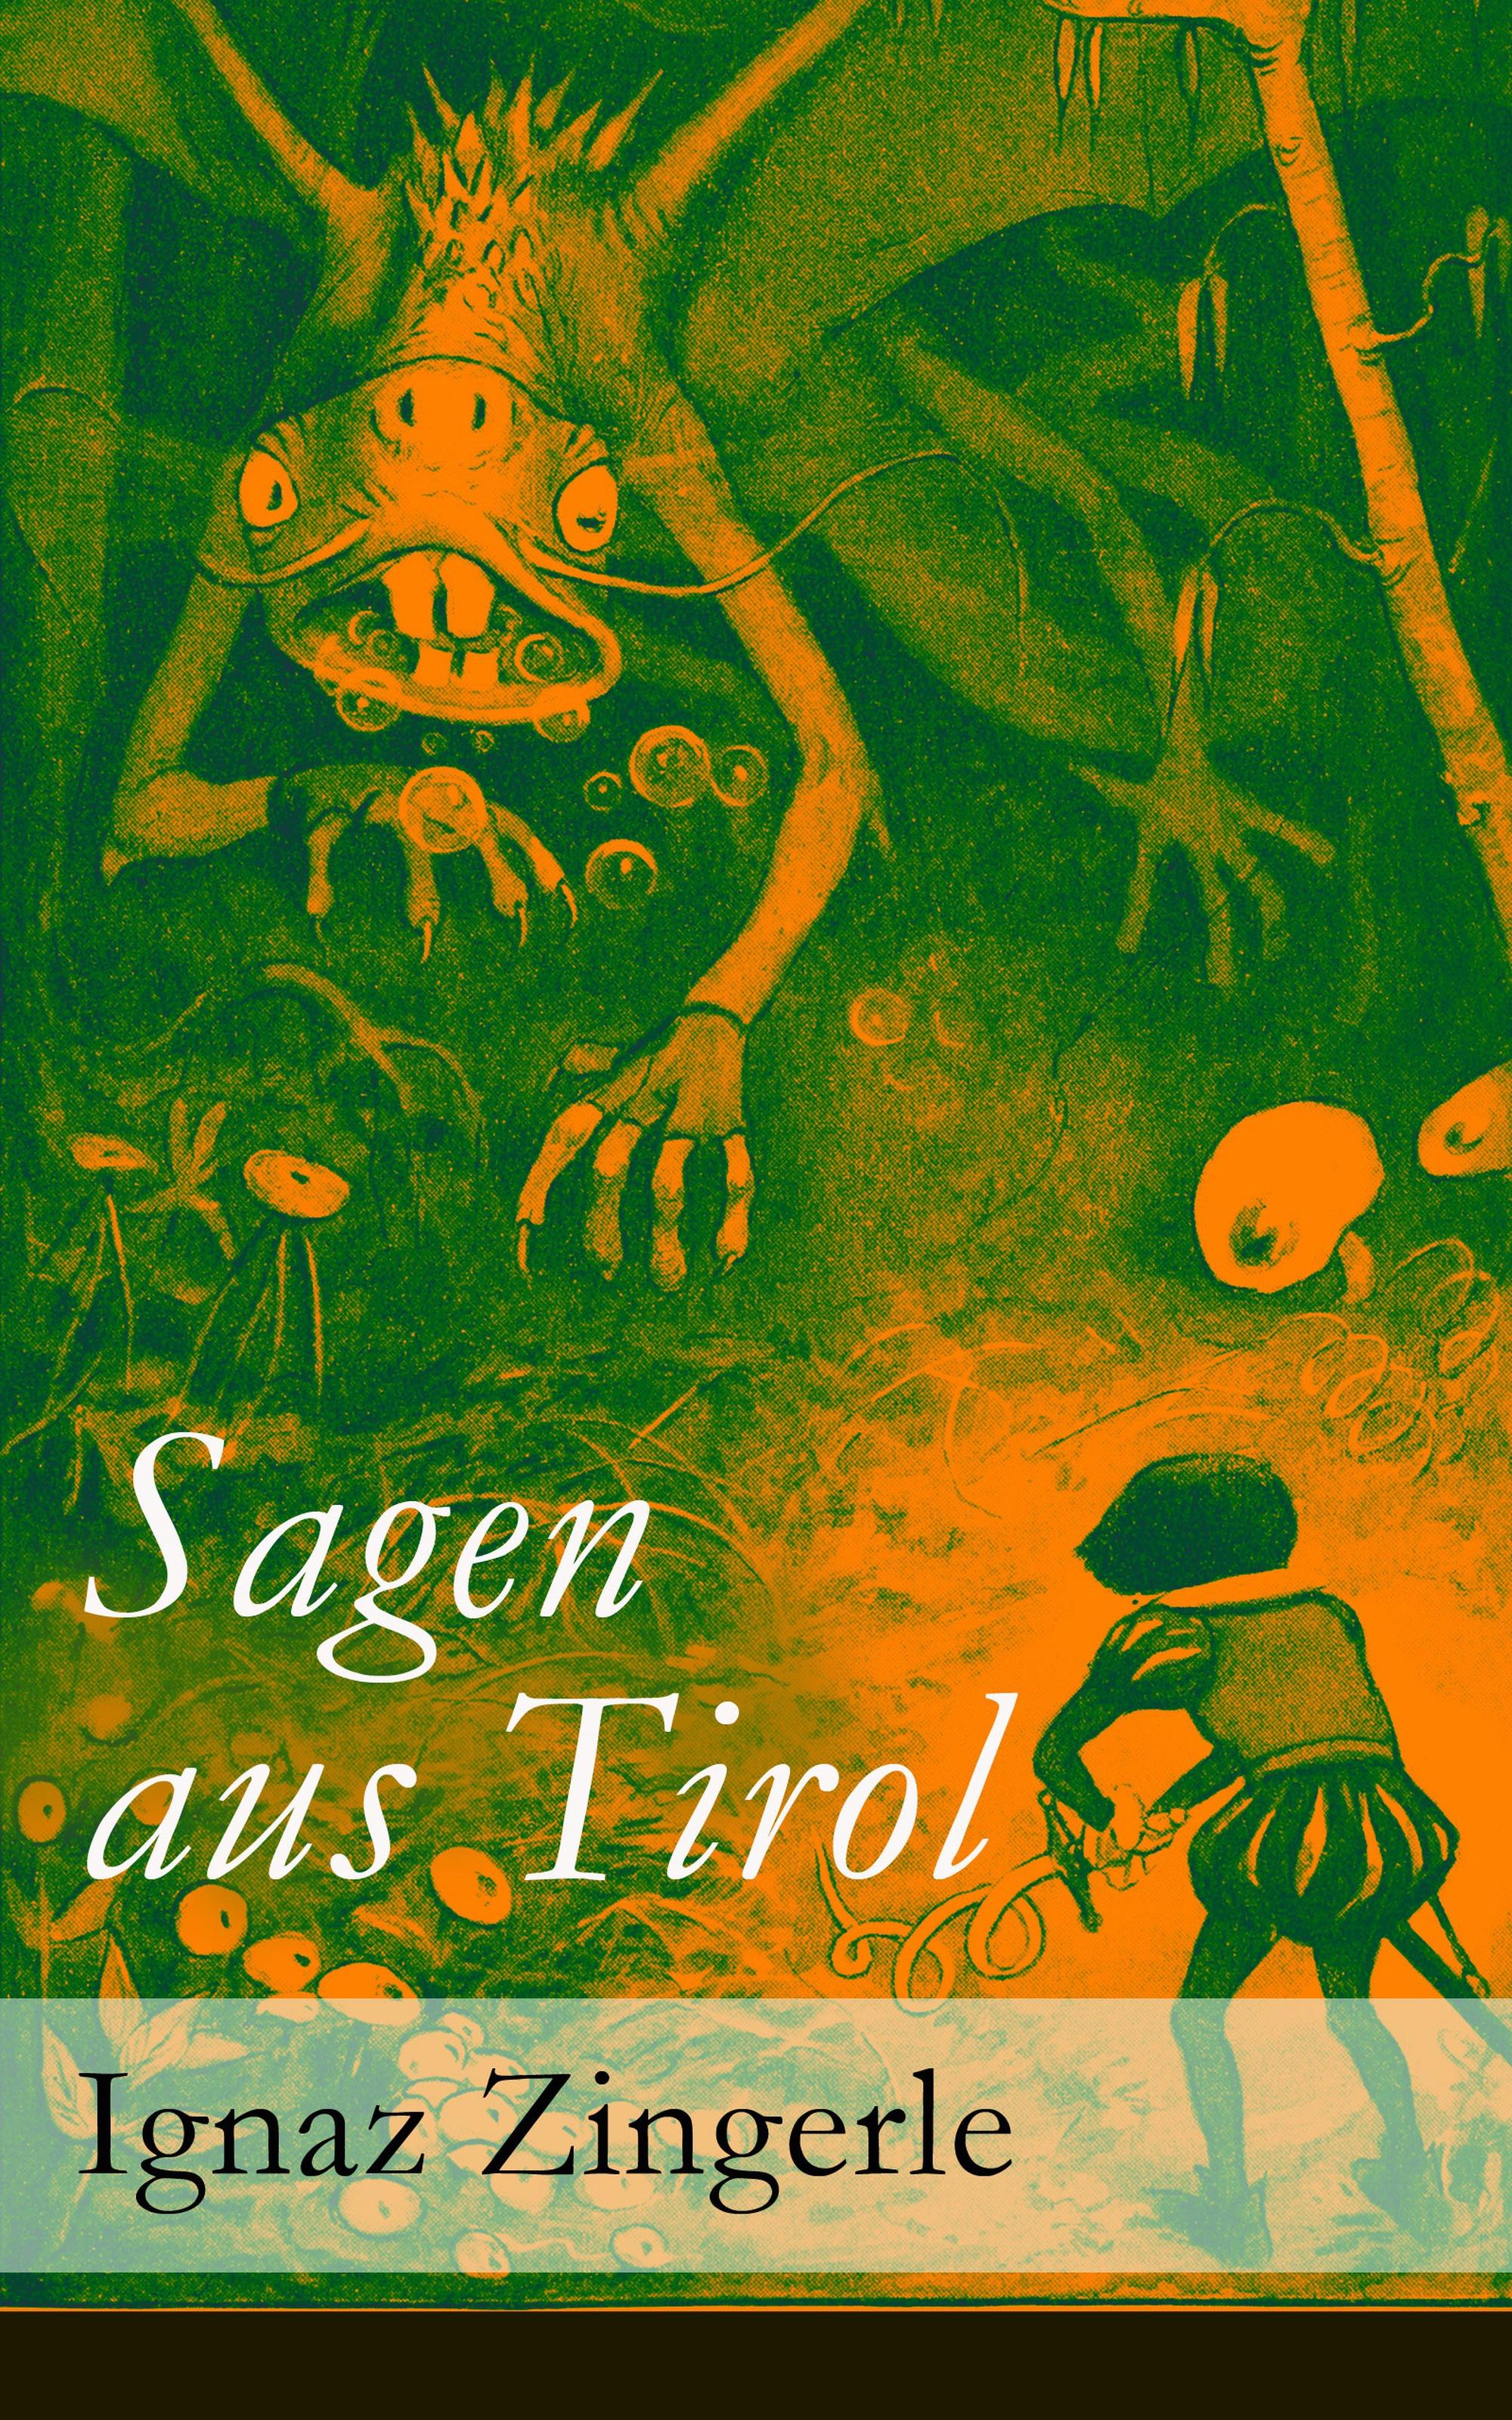 Ignaz Zingerle Sagen aus Tirol ignaz vincenz zingerle sagen aus tirol german edition